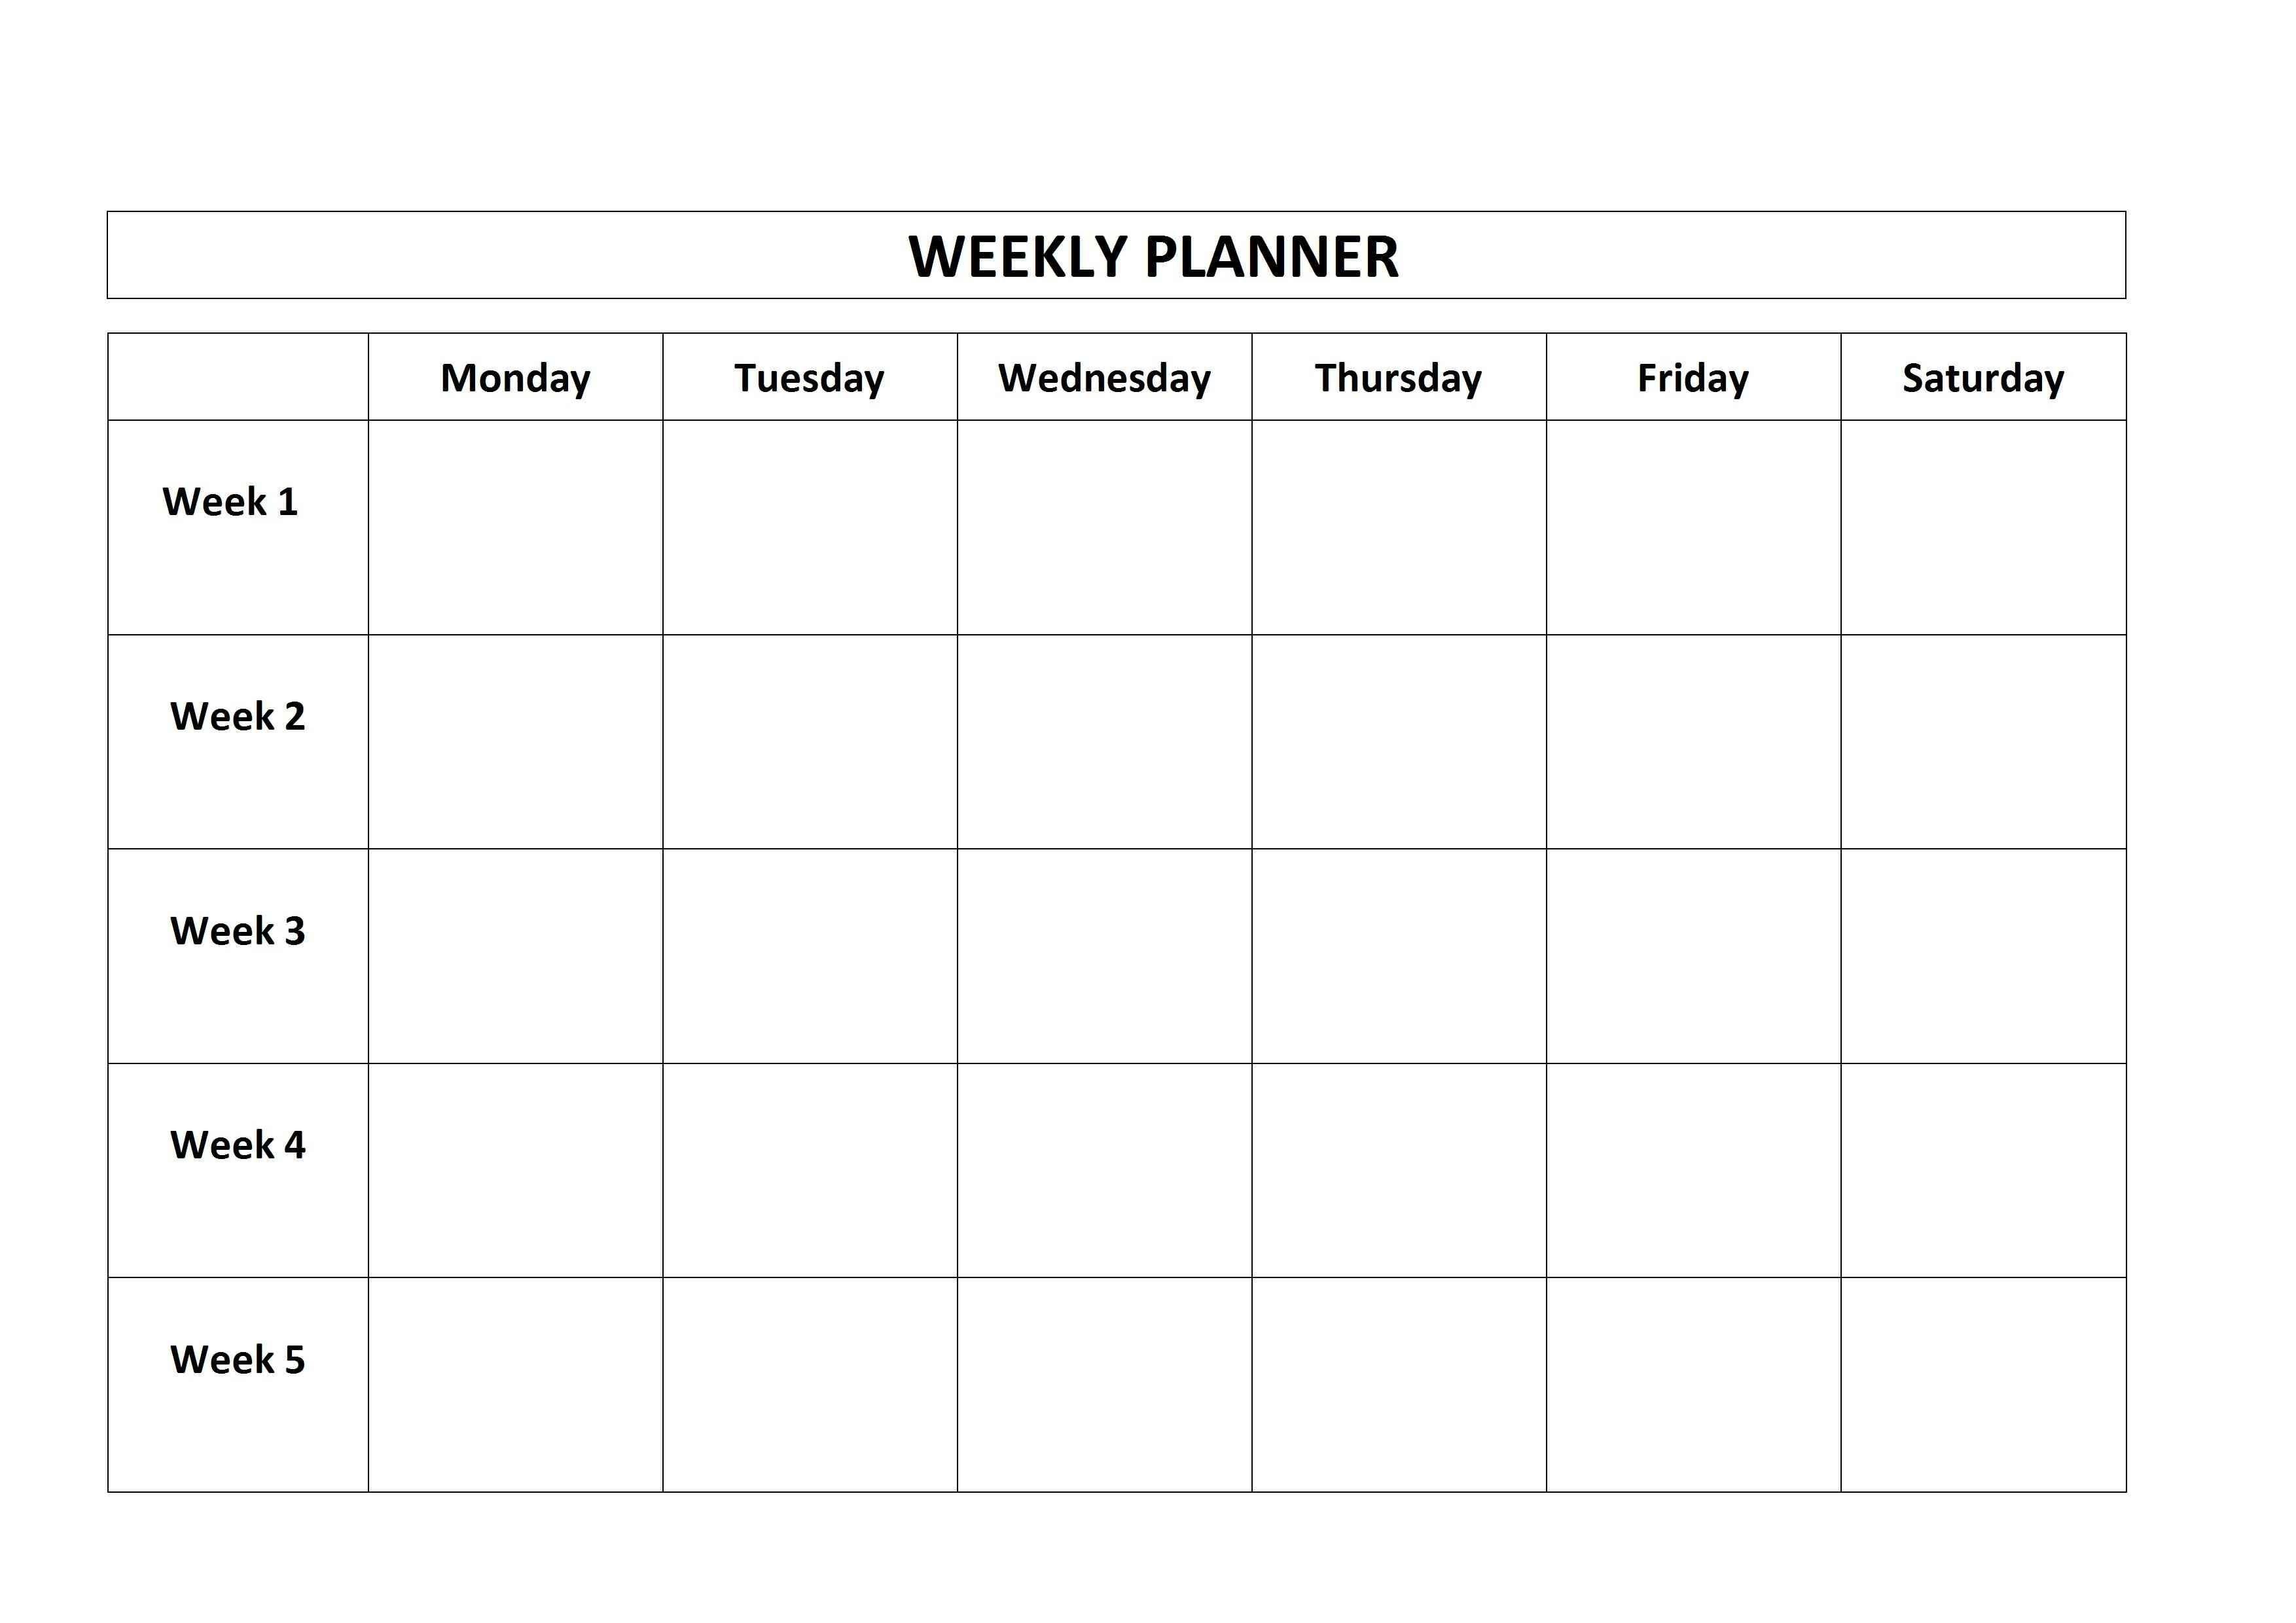 Free Printable Weekly Planner Monday Friday School Calendar-One Week Monday Through Friday Calendar Template